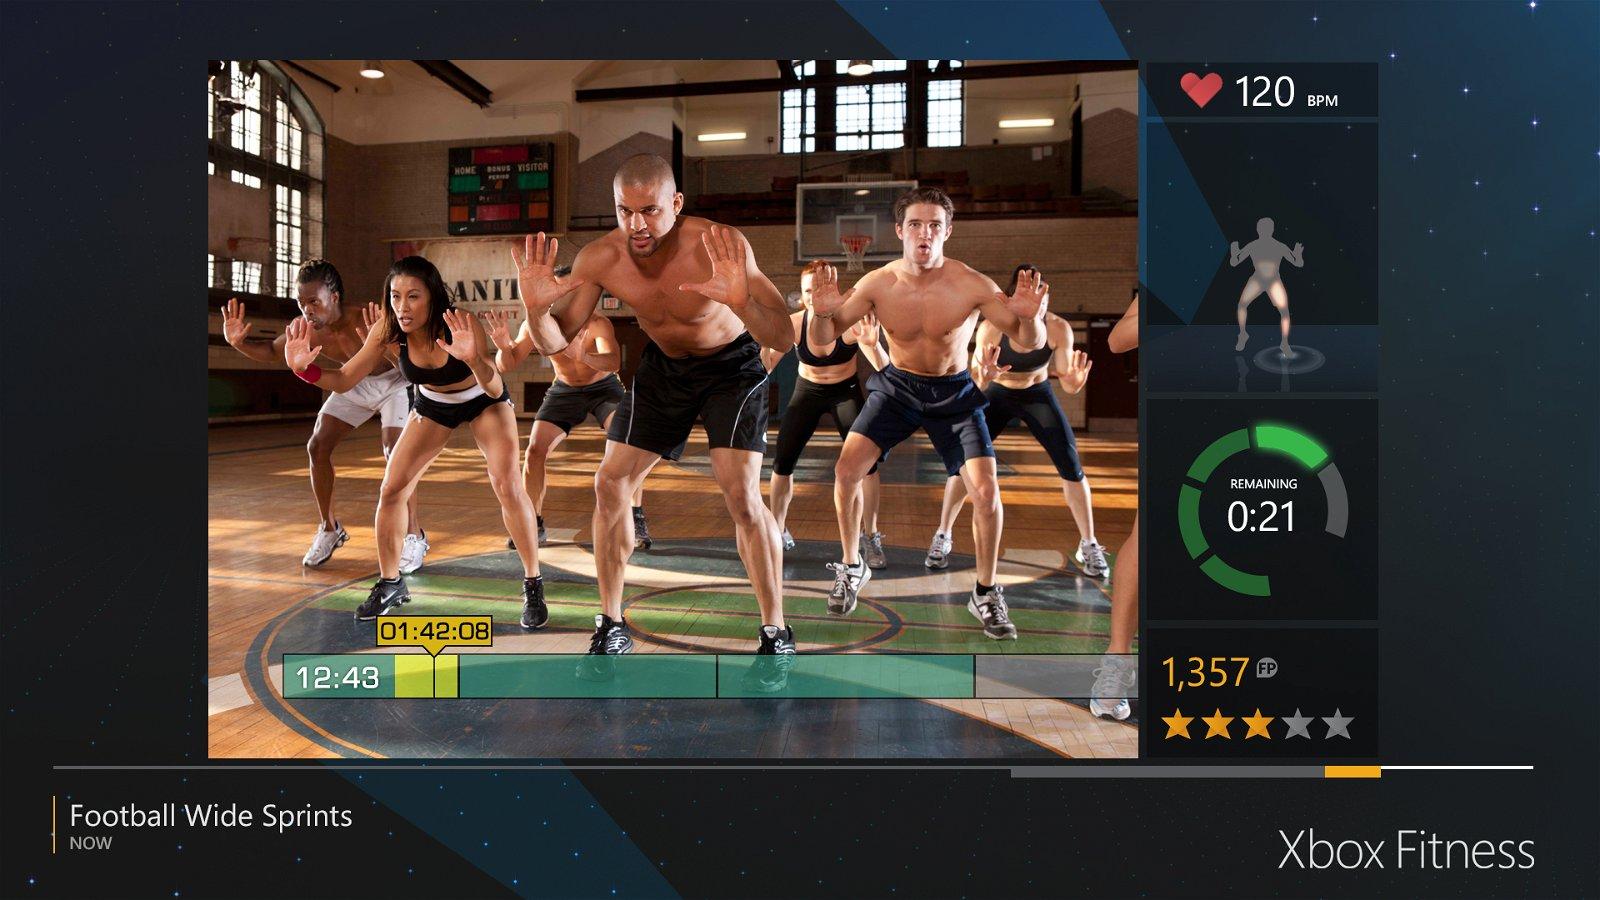 Xbox Fitness Shutting Down